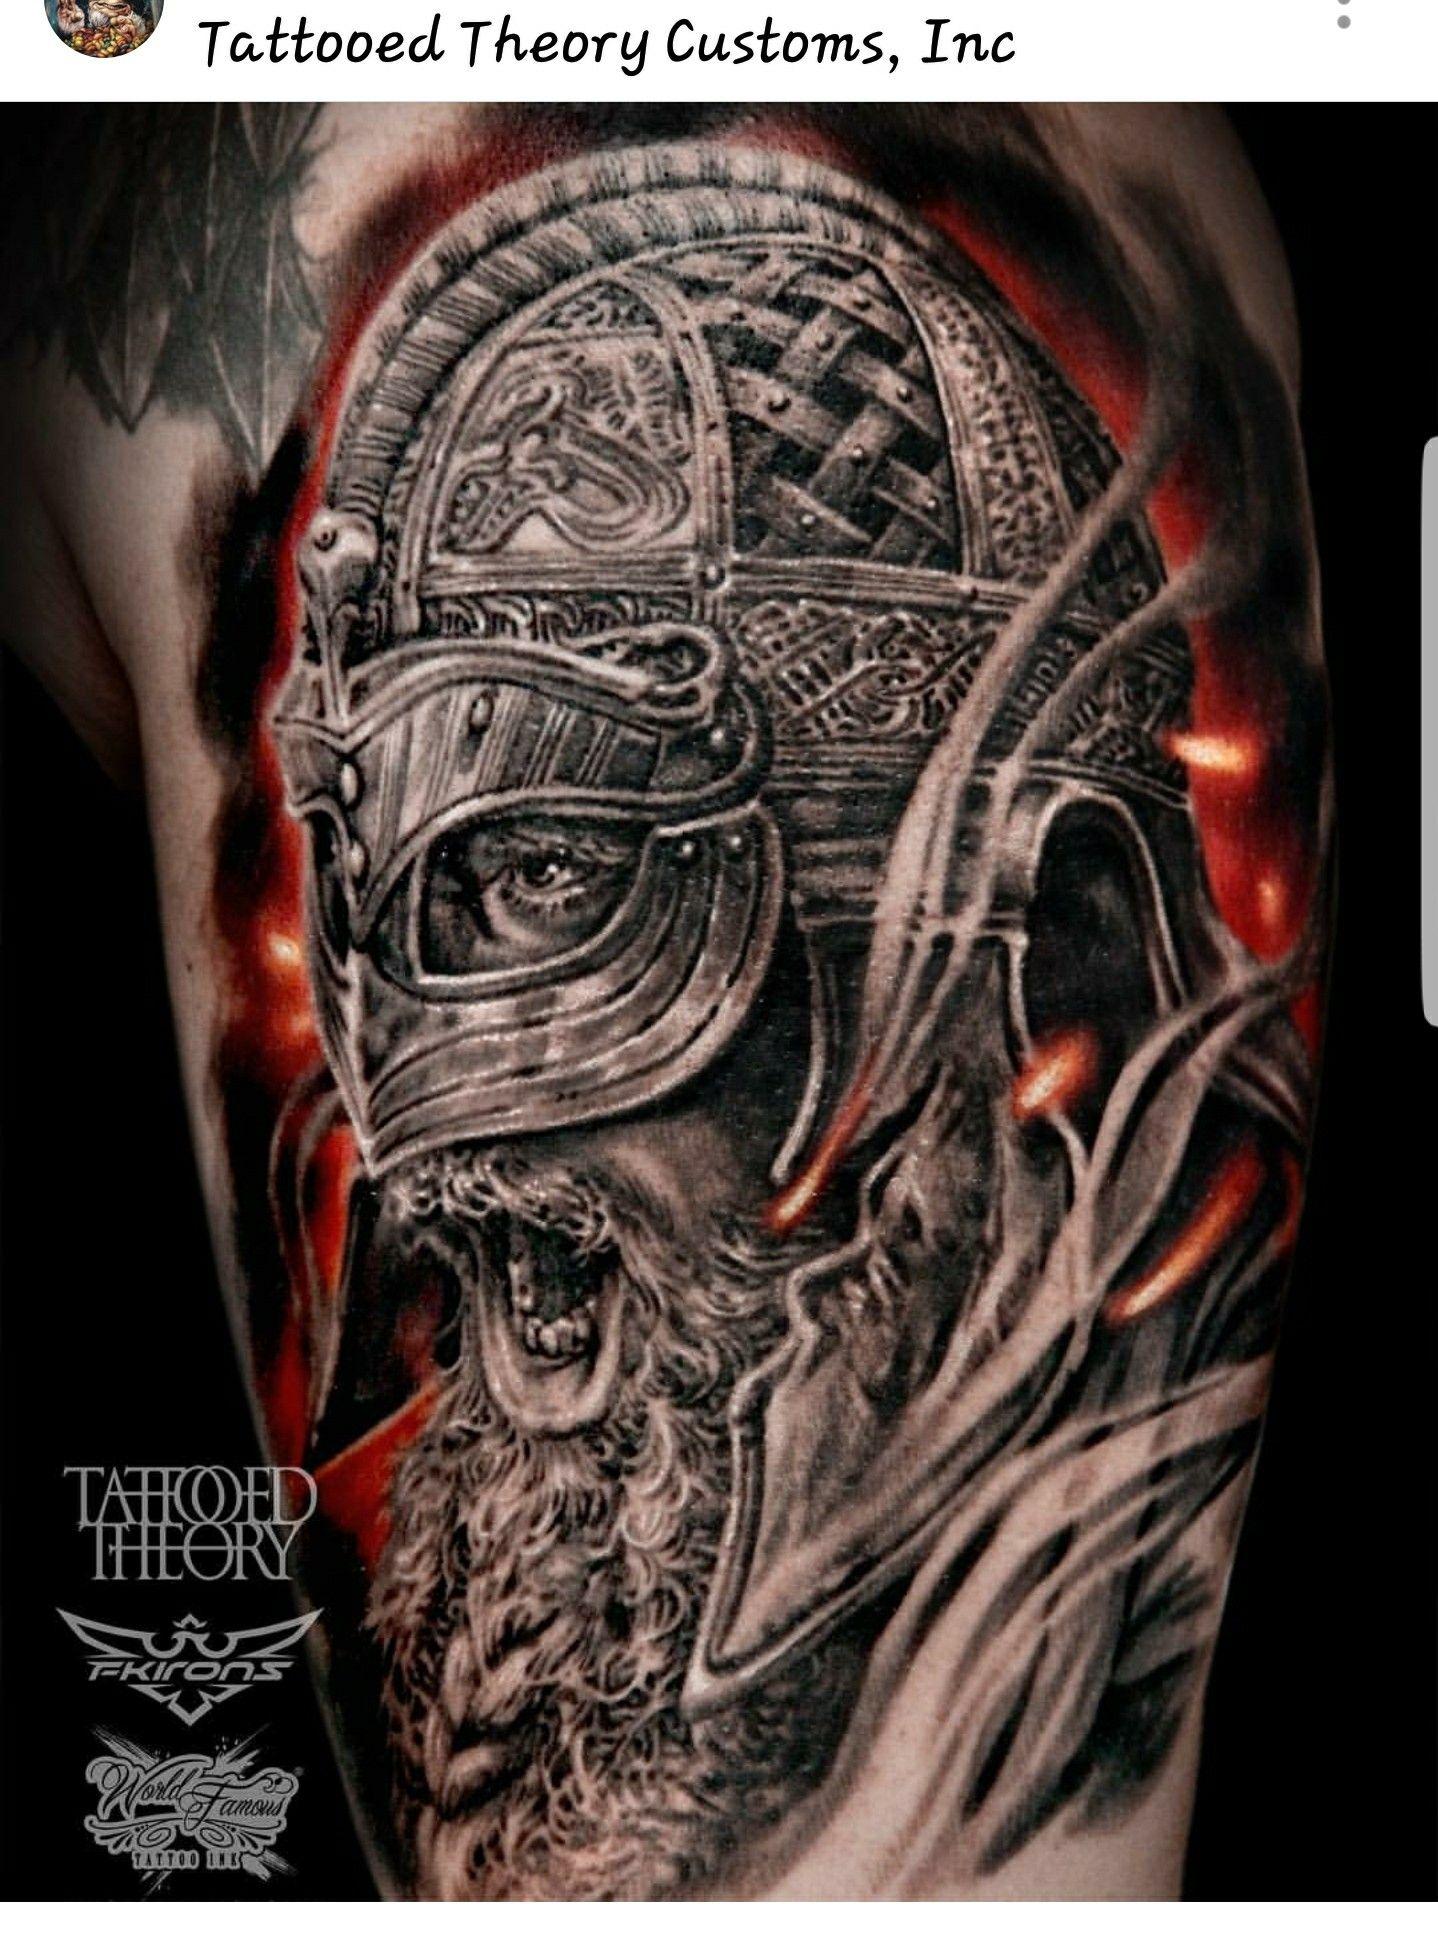 Norse/Viking warrior tattoo by javi_tattooedtheory